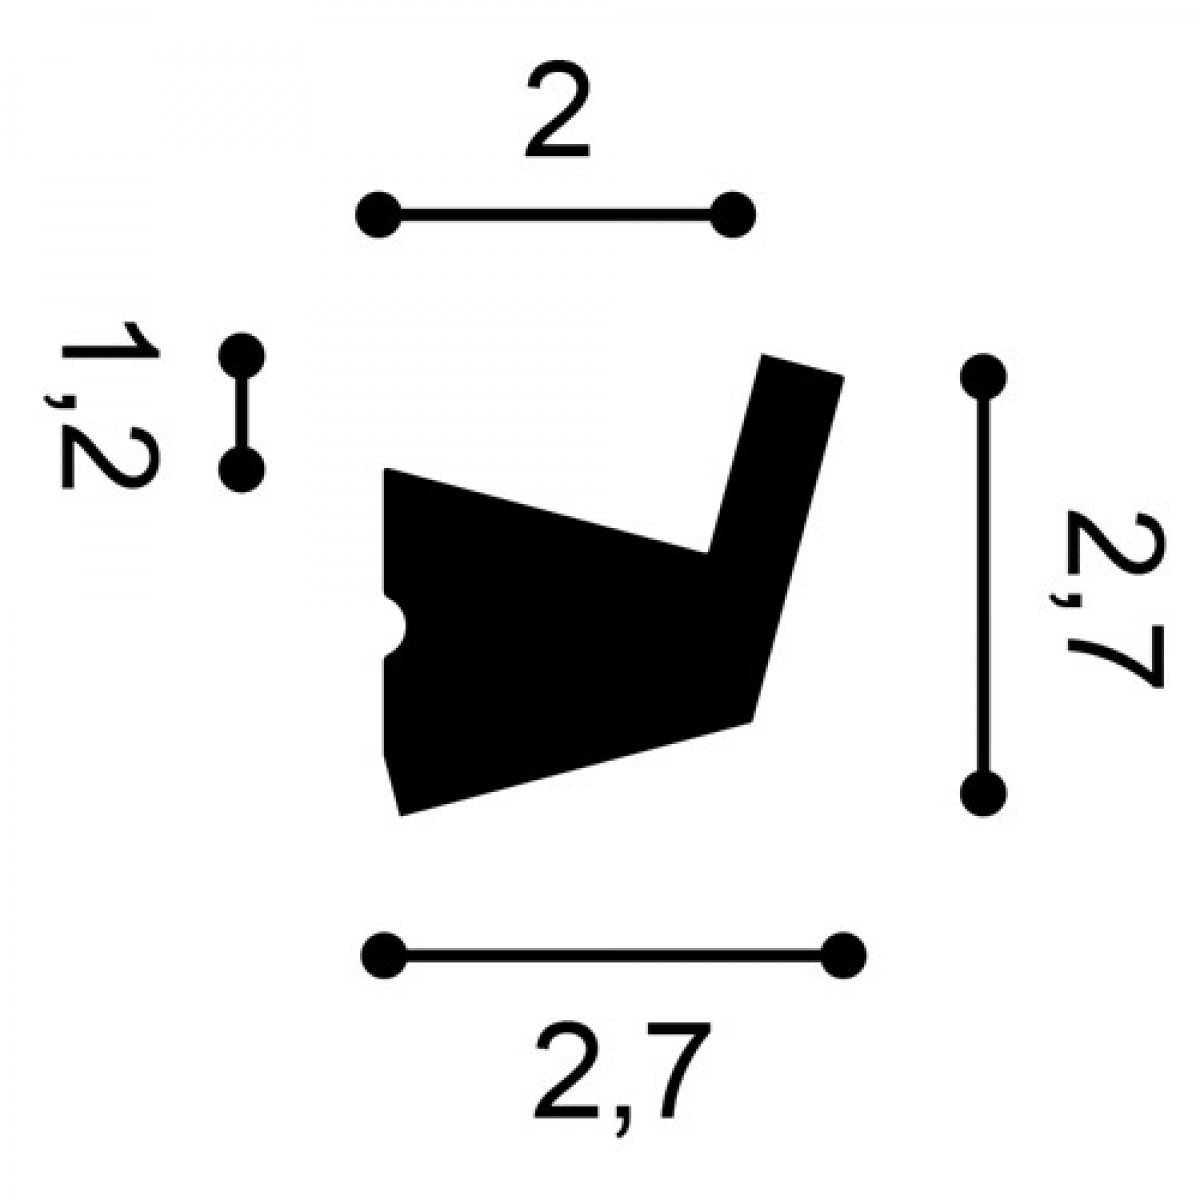 Cornisa Flex Axxent CX189F, Dimensiuni: 200 X 2.7 X 2.7 cm, Orac Decor